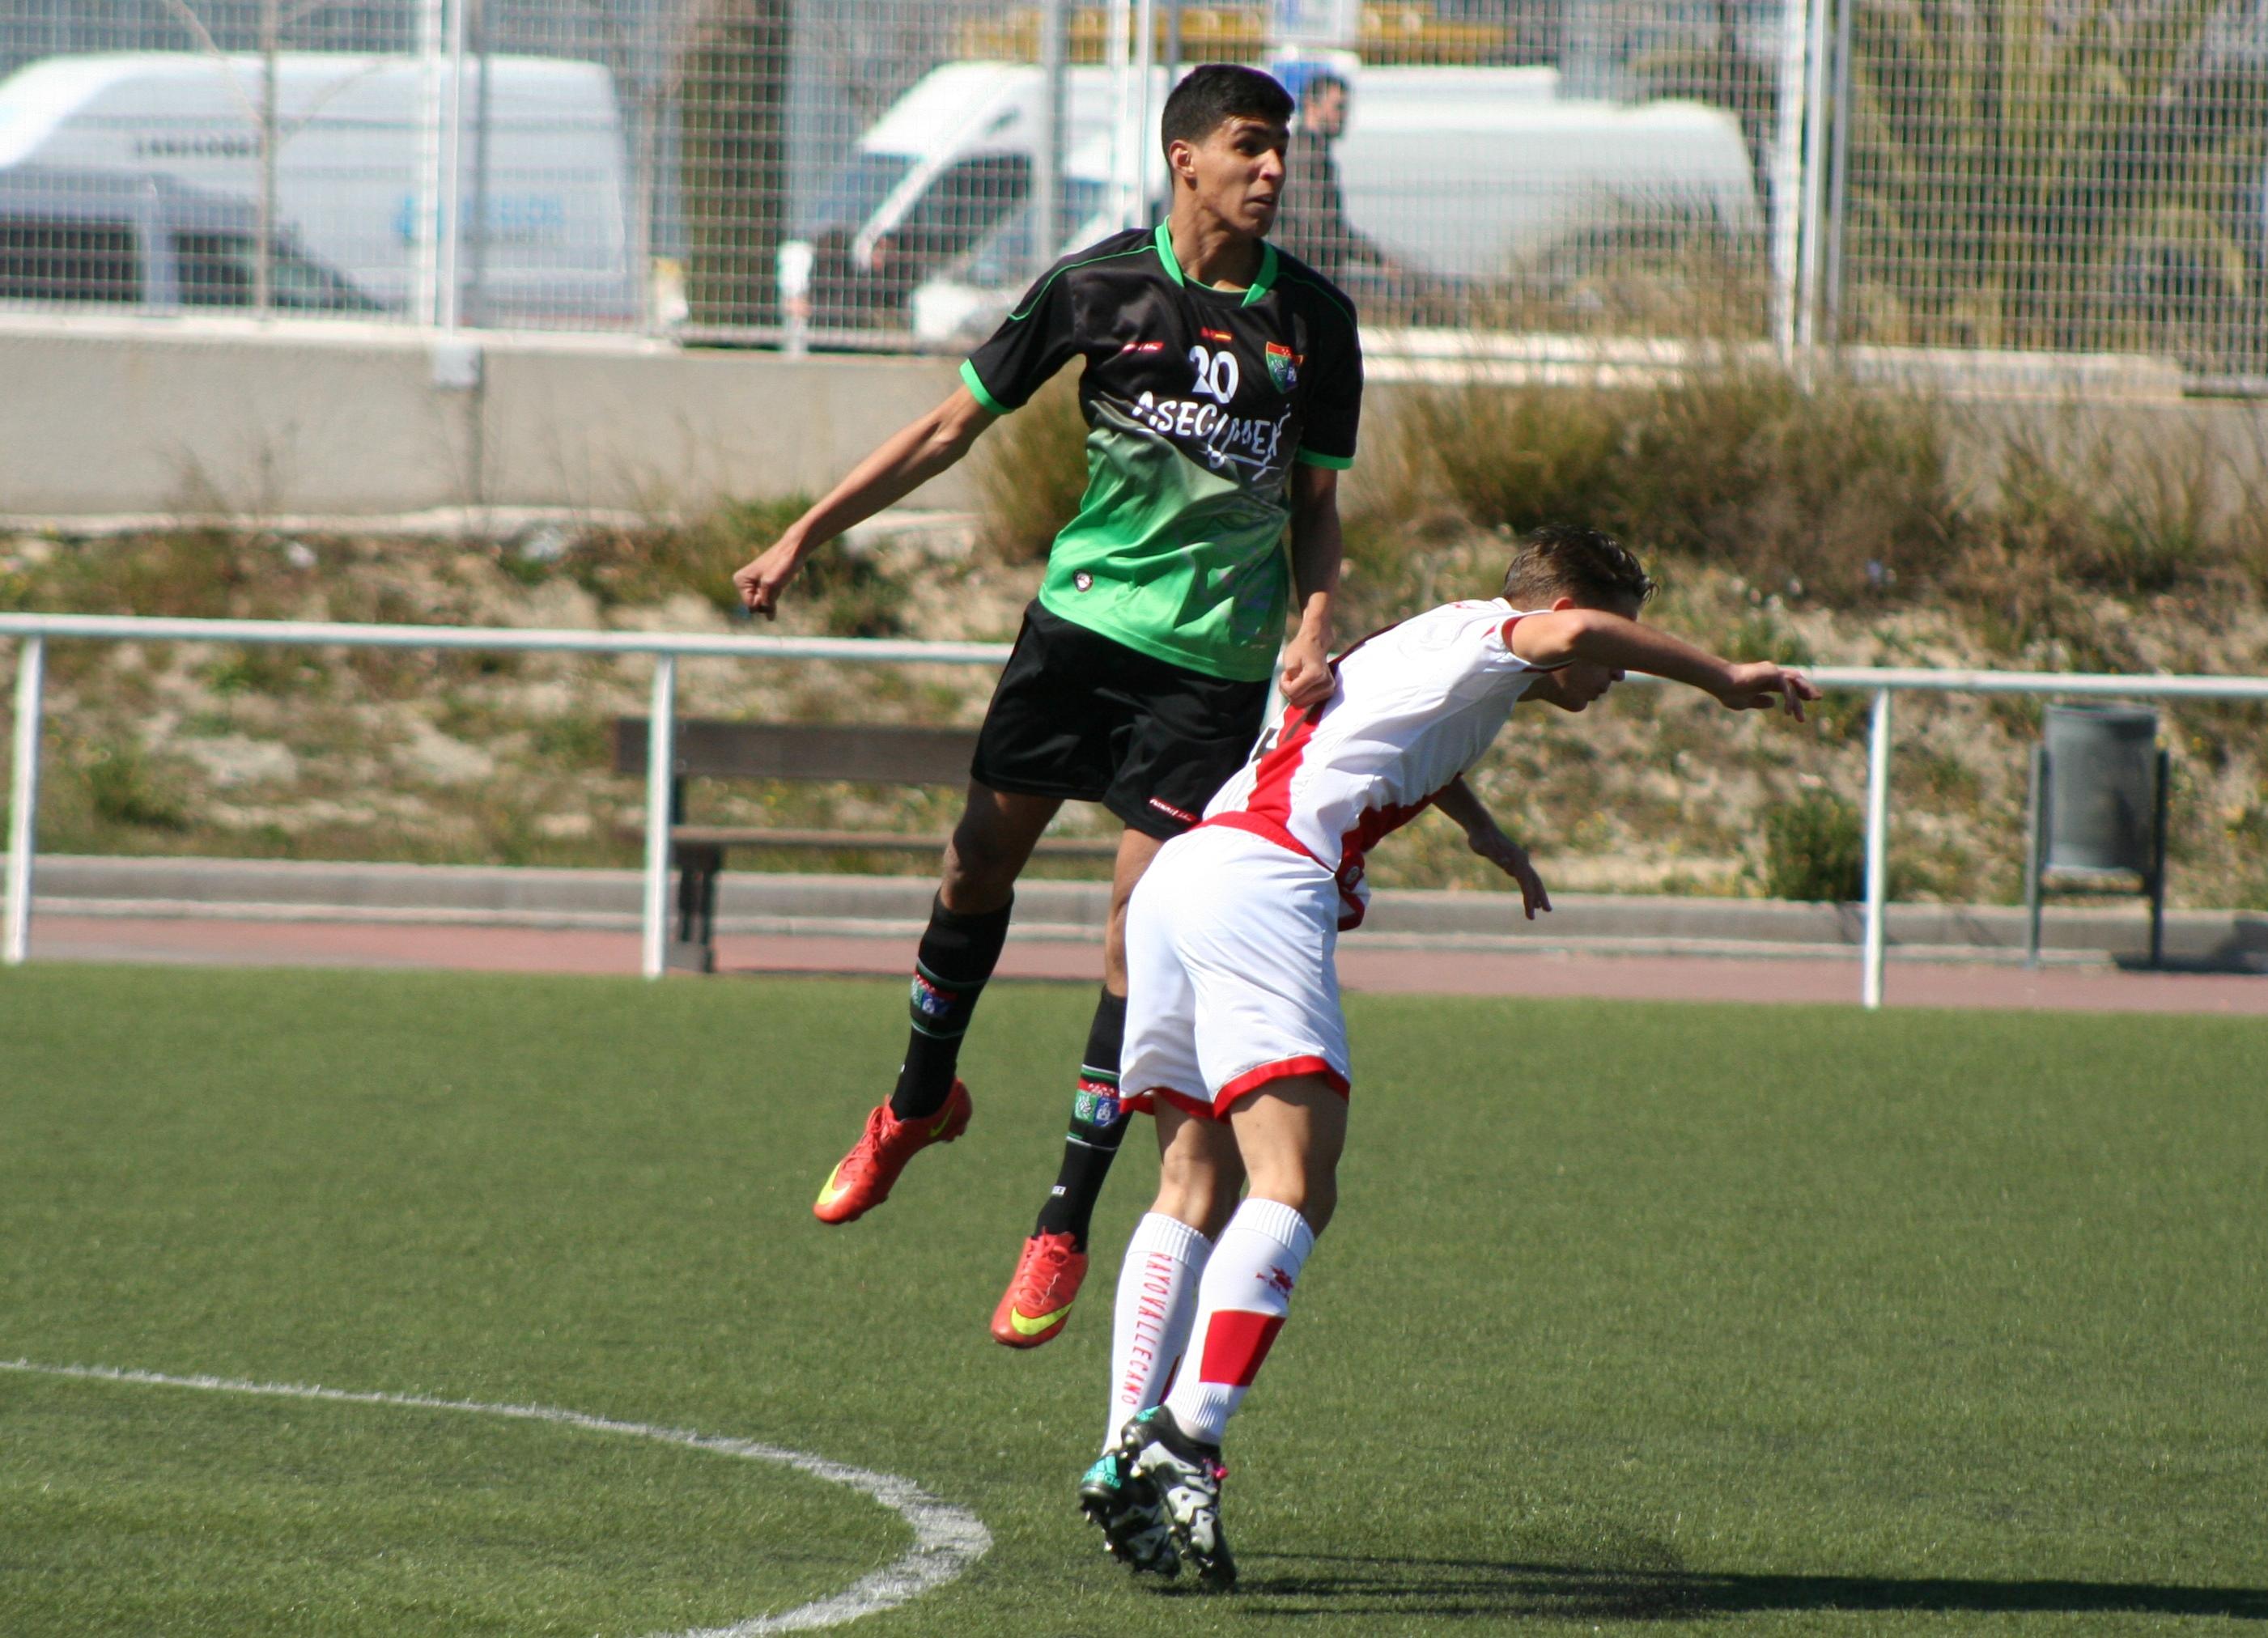 Fotos del partido de liga Rayo Vallecano A 1 -2 EDM Cadete A